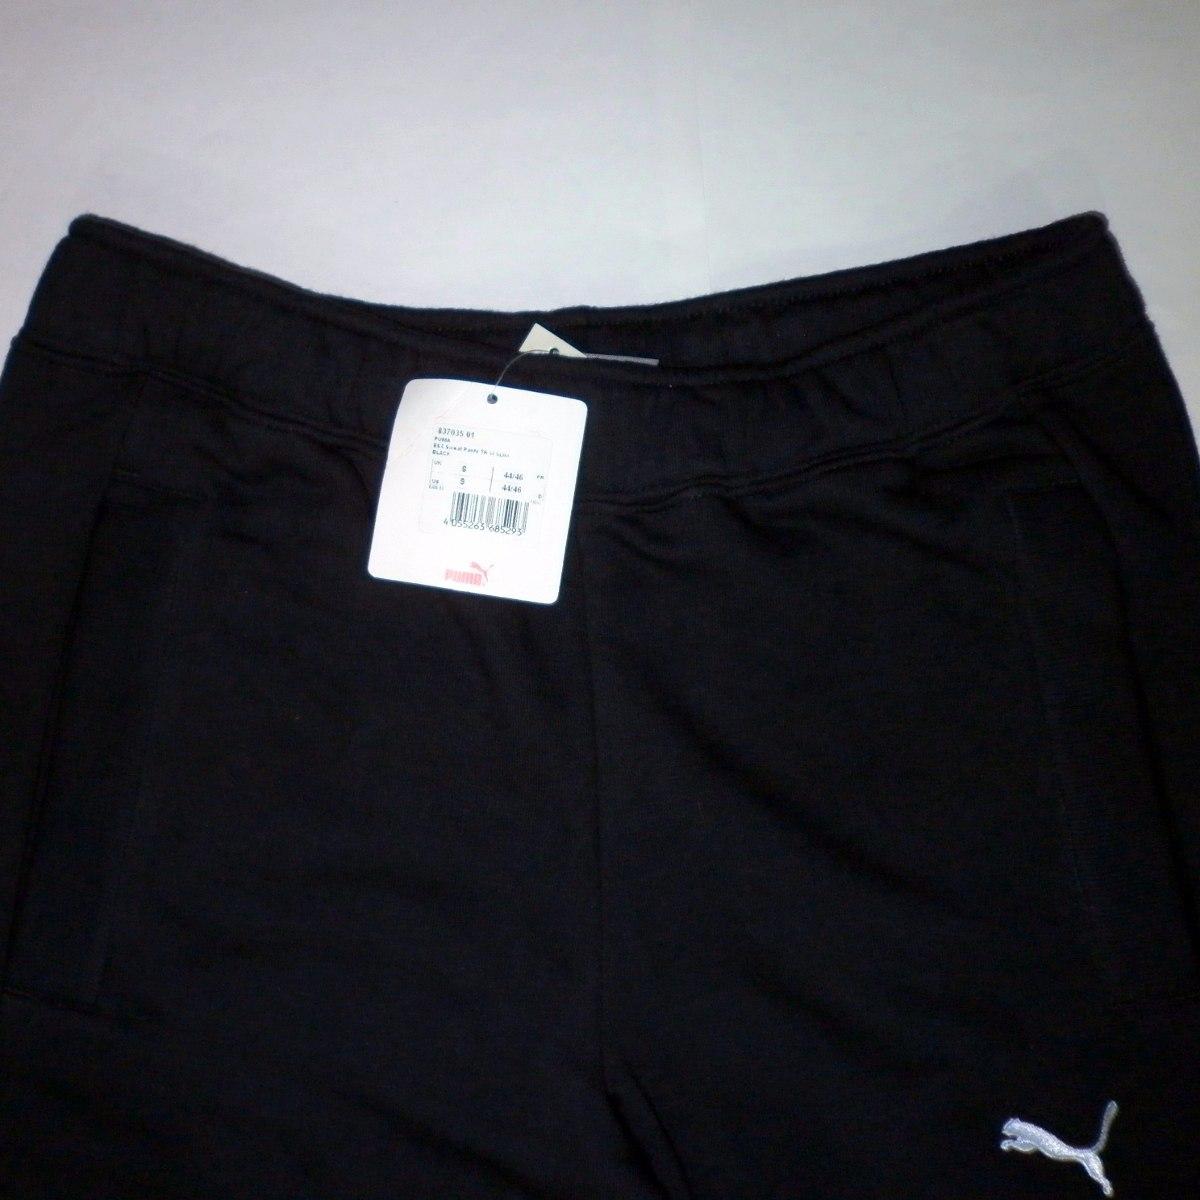 Pantalón 00 En Ess 1 Sweat Slim Cl Pants Tr Puma Promo 099 AAqxrFv